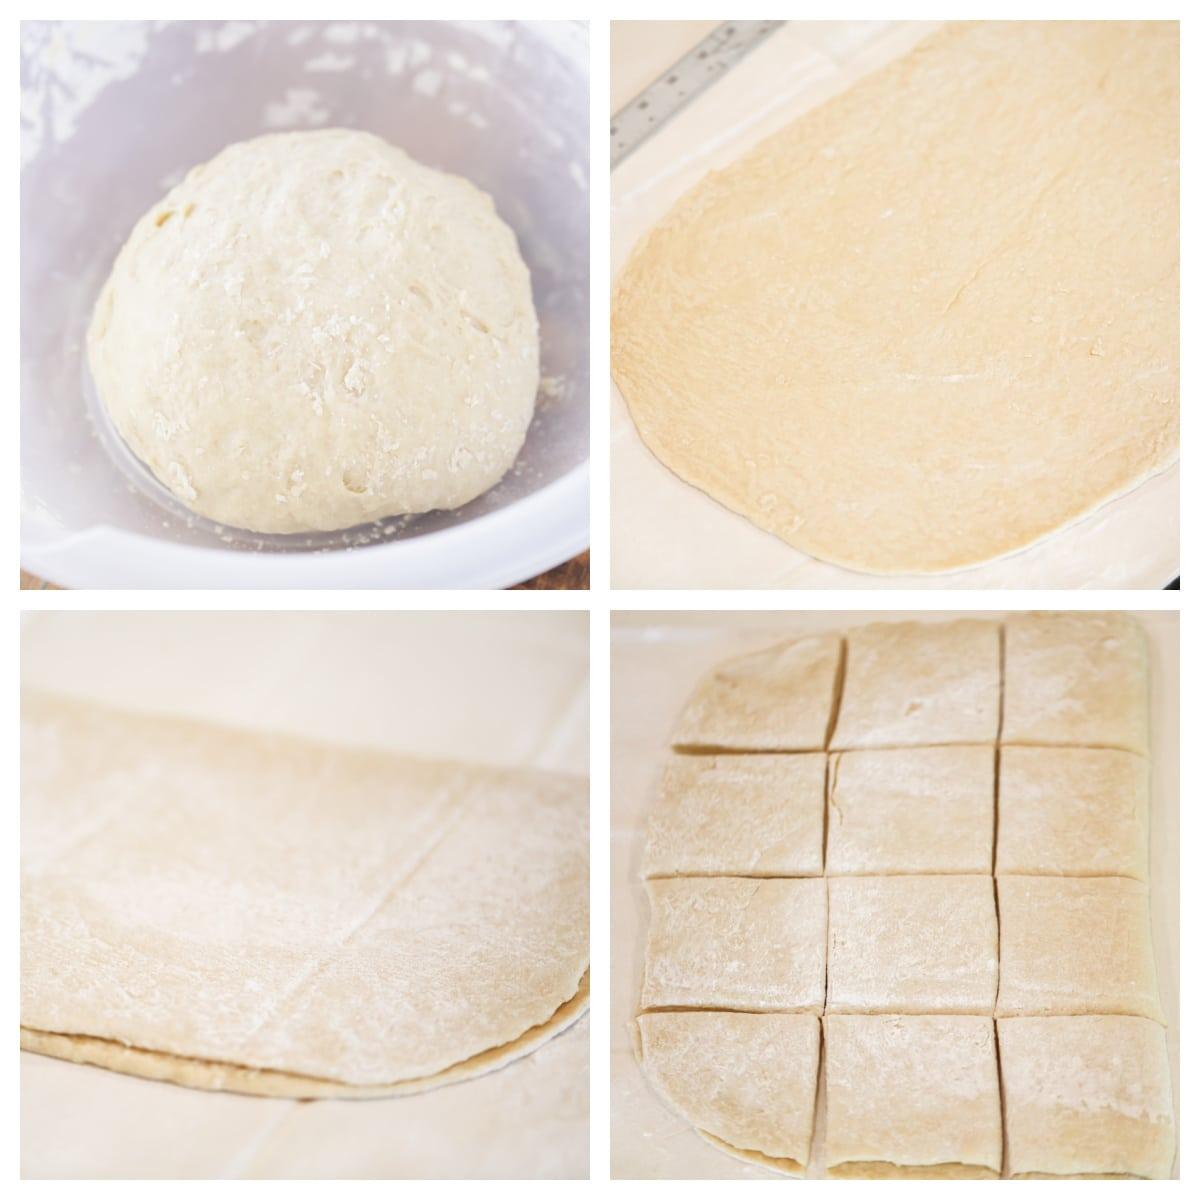 Dough ball, rolled dough, cut dough